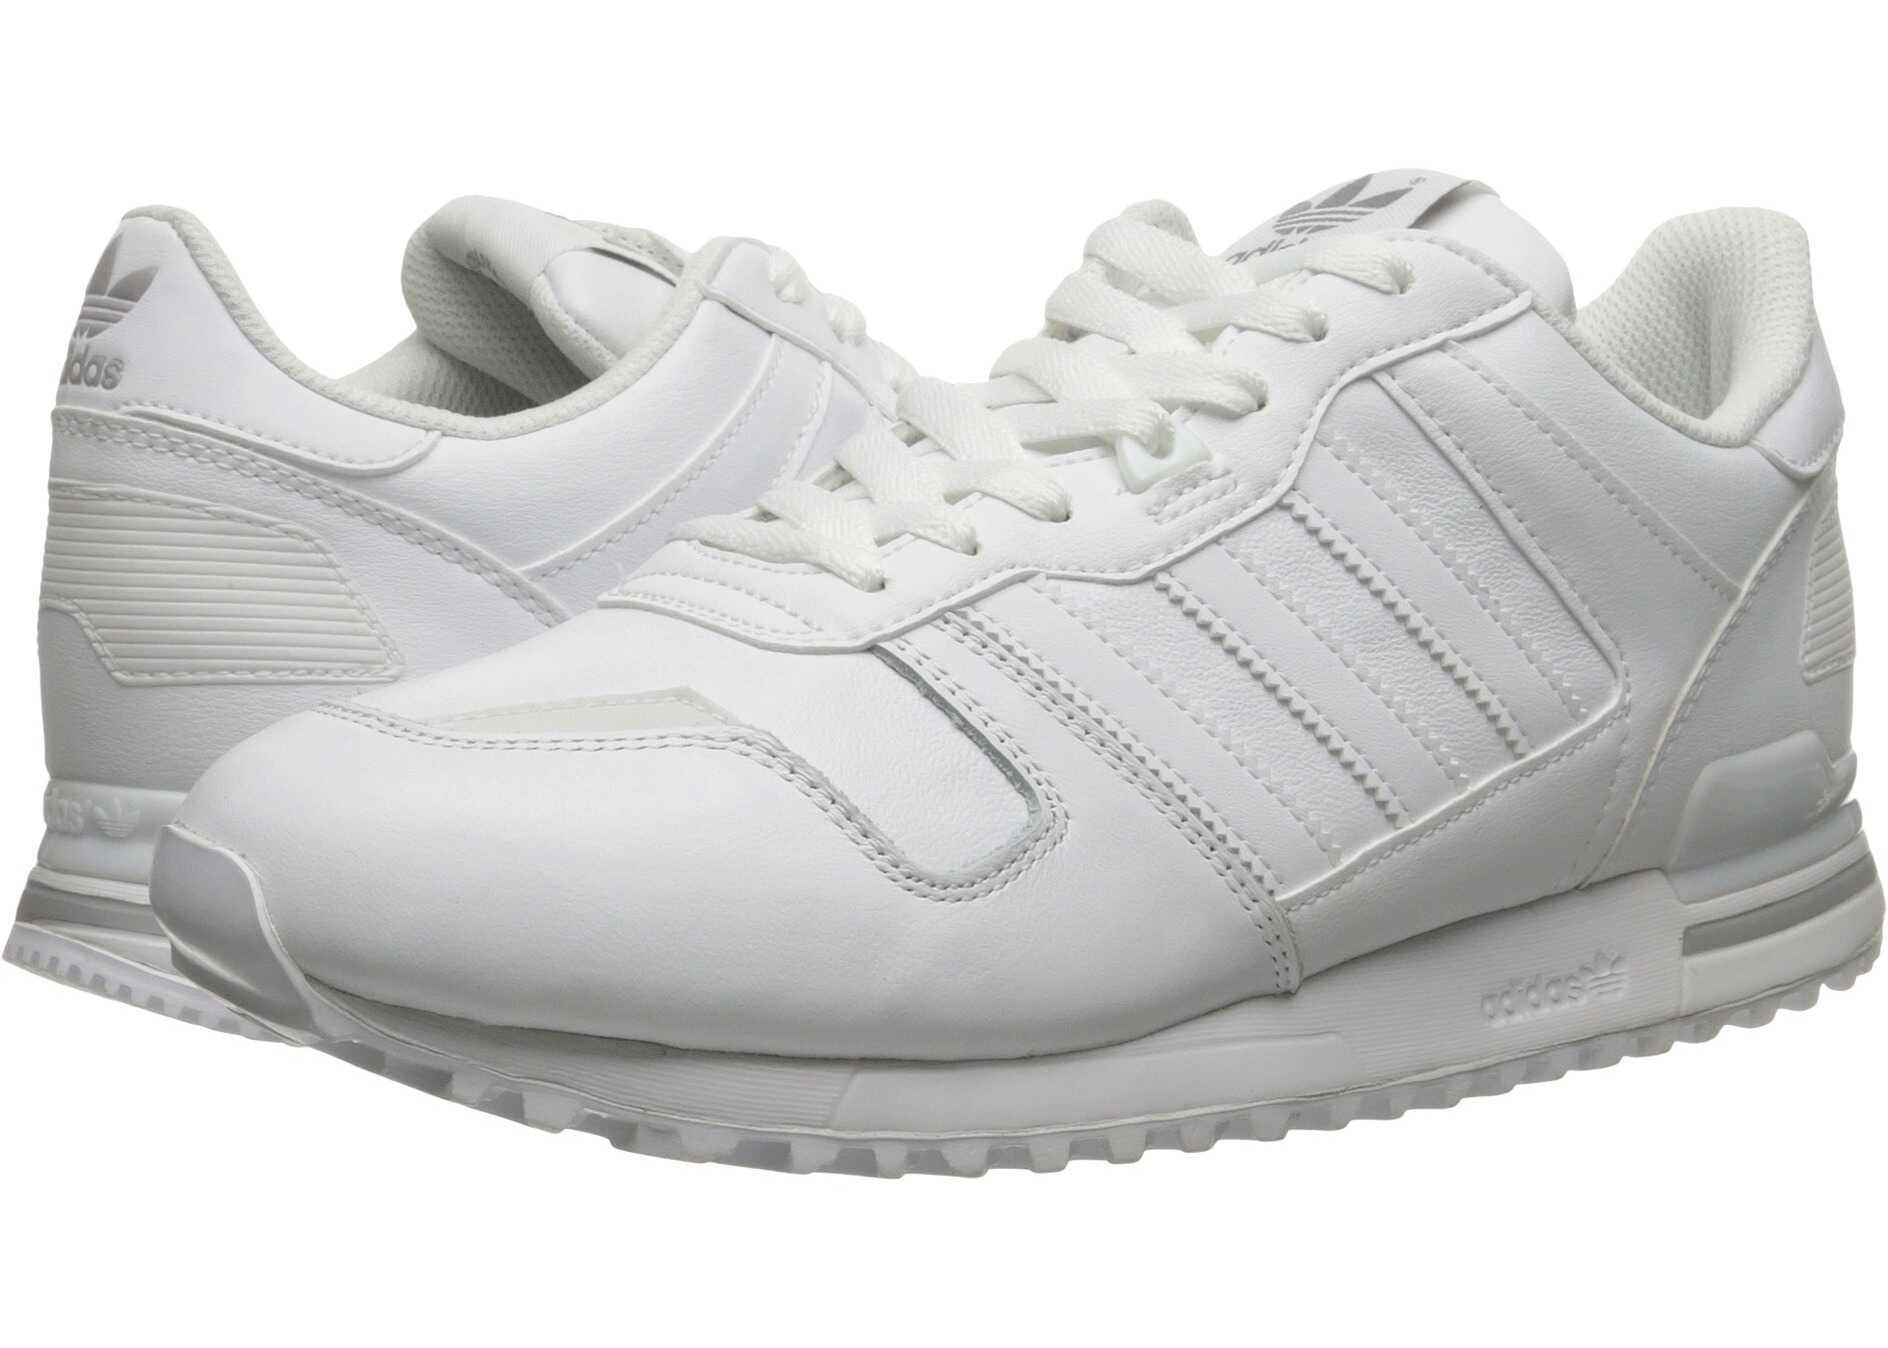 Pantofi Sport Barbati Adidas Originals Zx 700 Foot